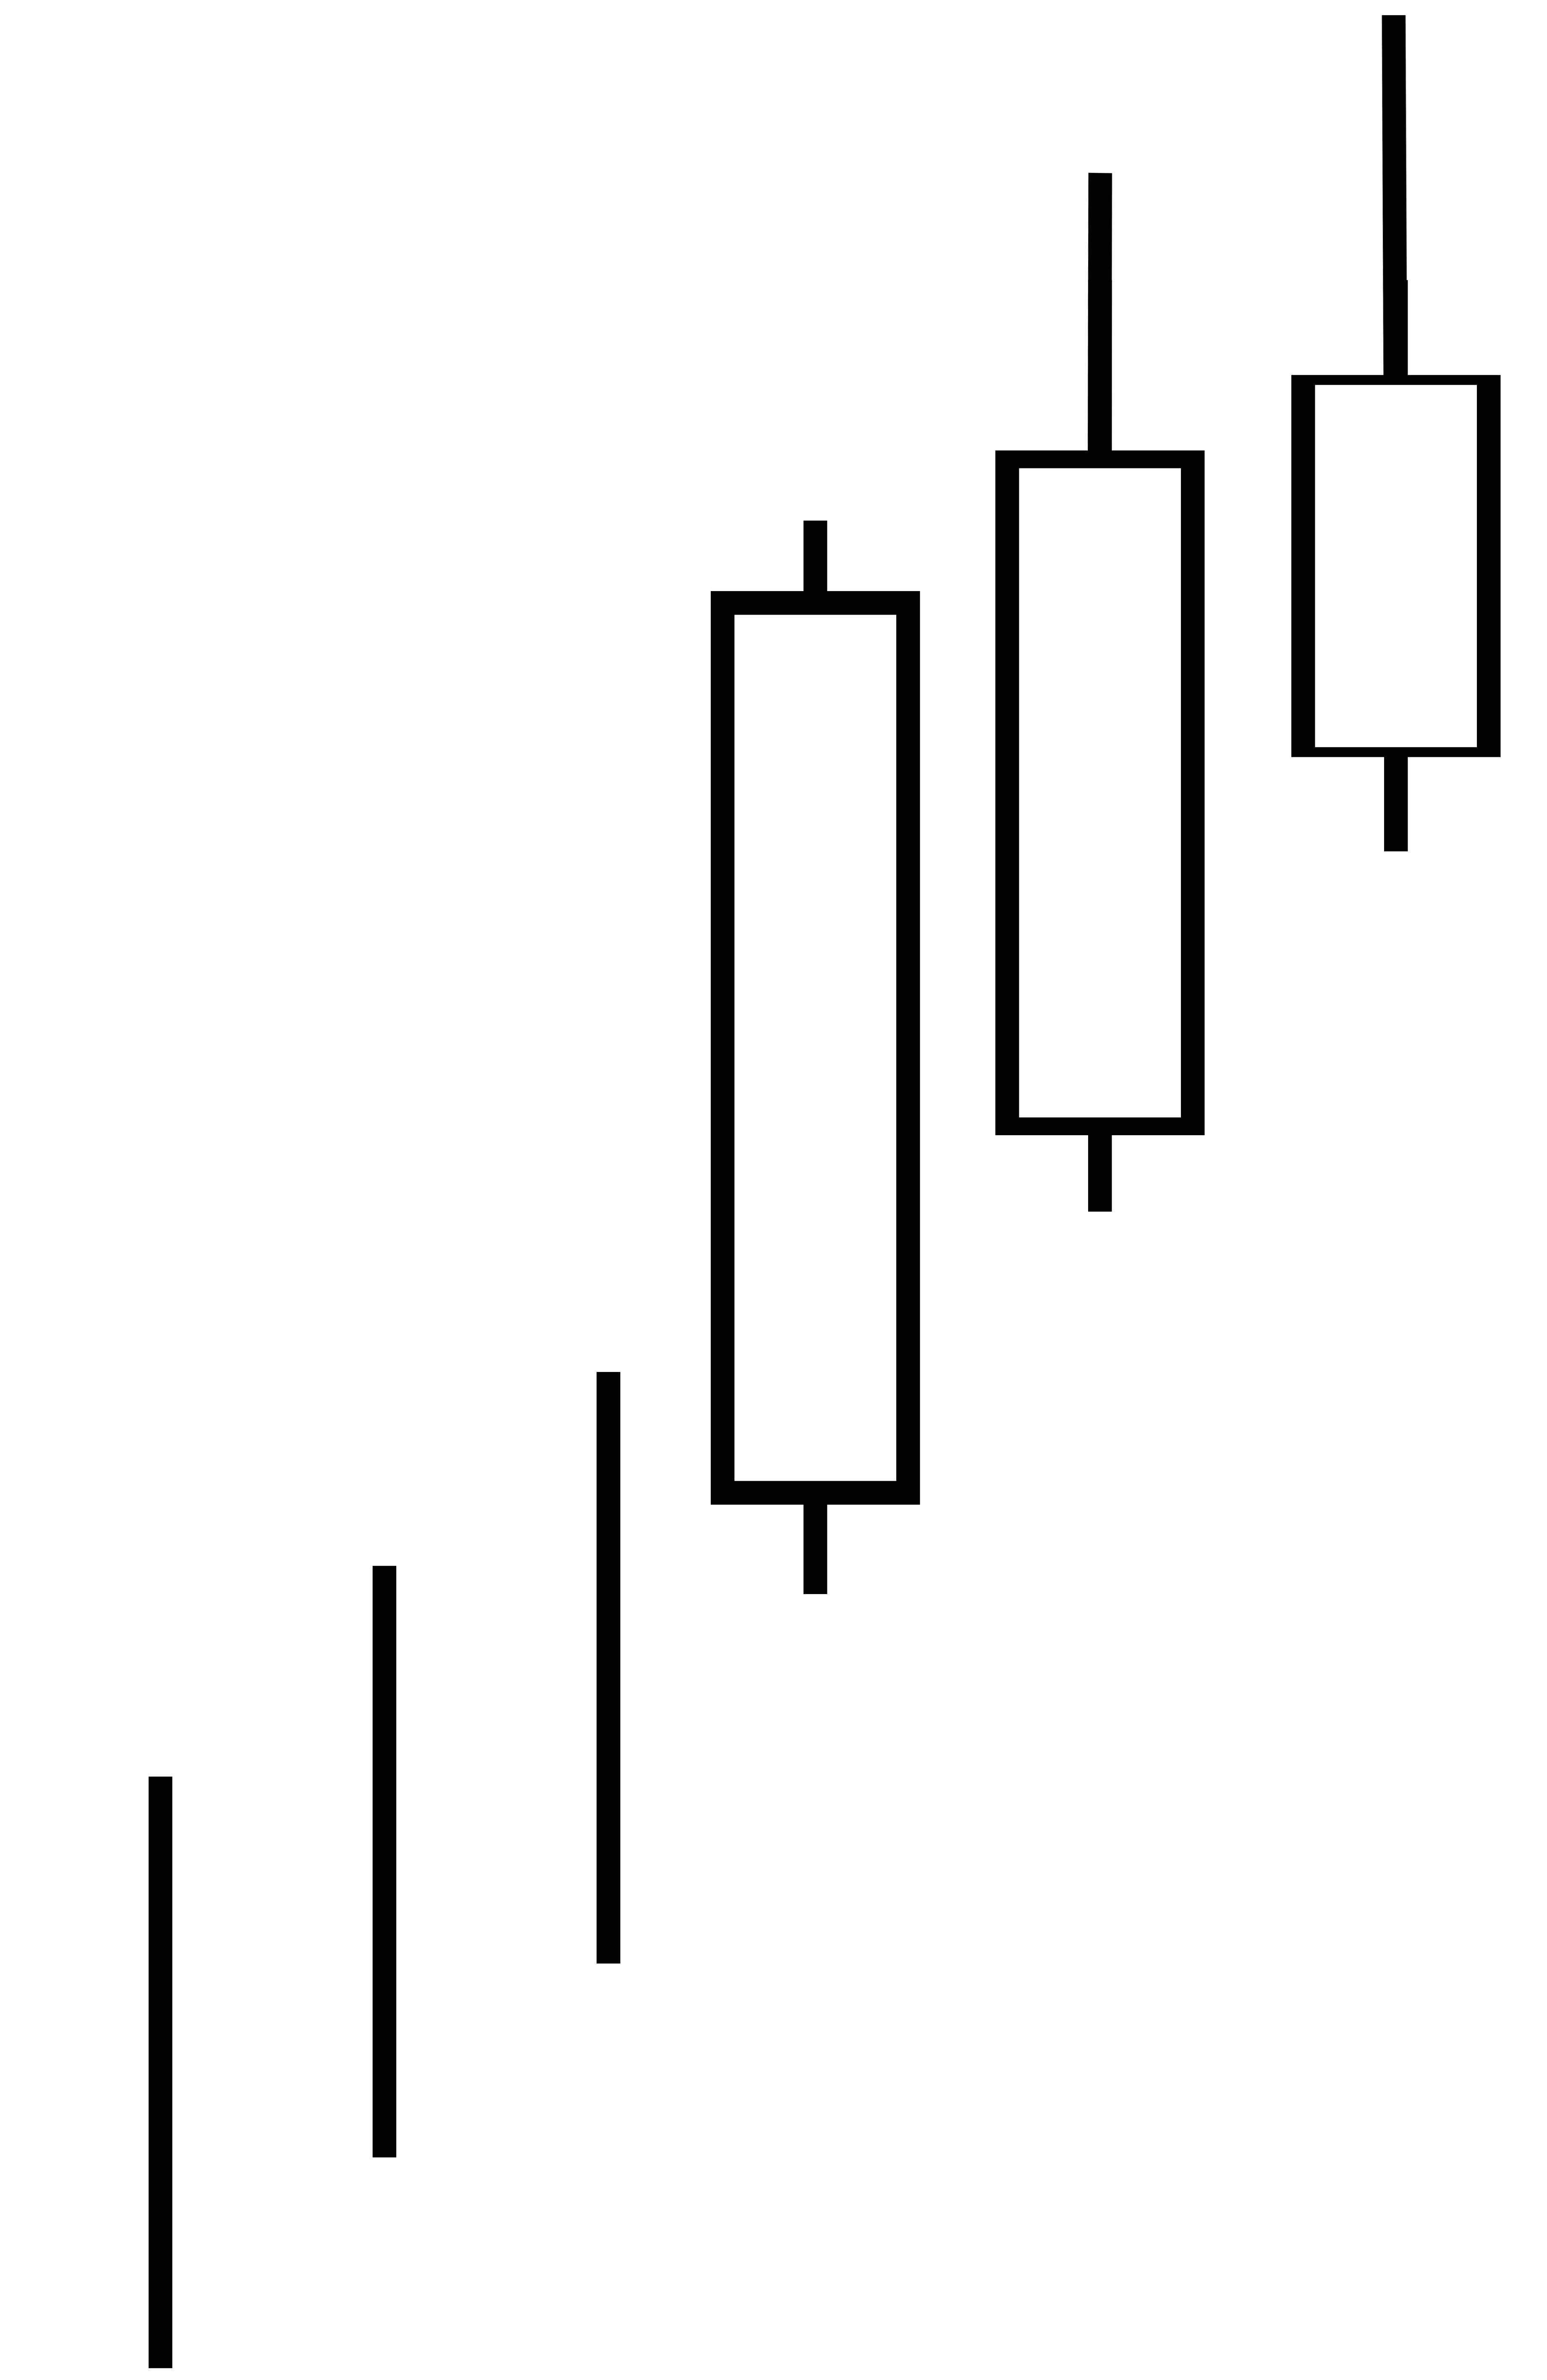 Pro trader advanced forex course pdf